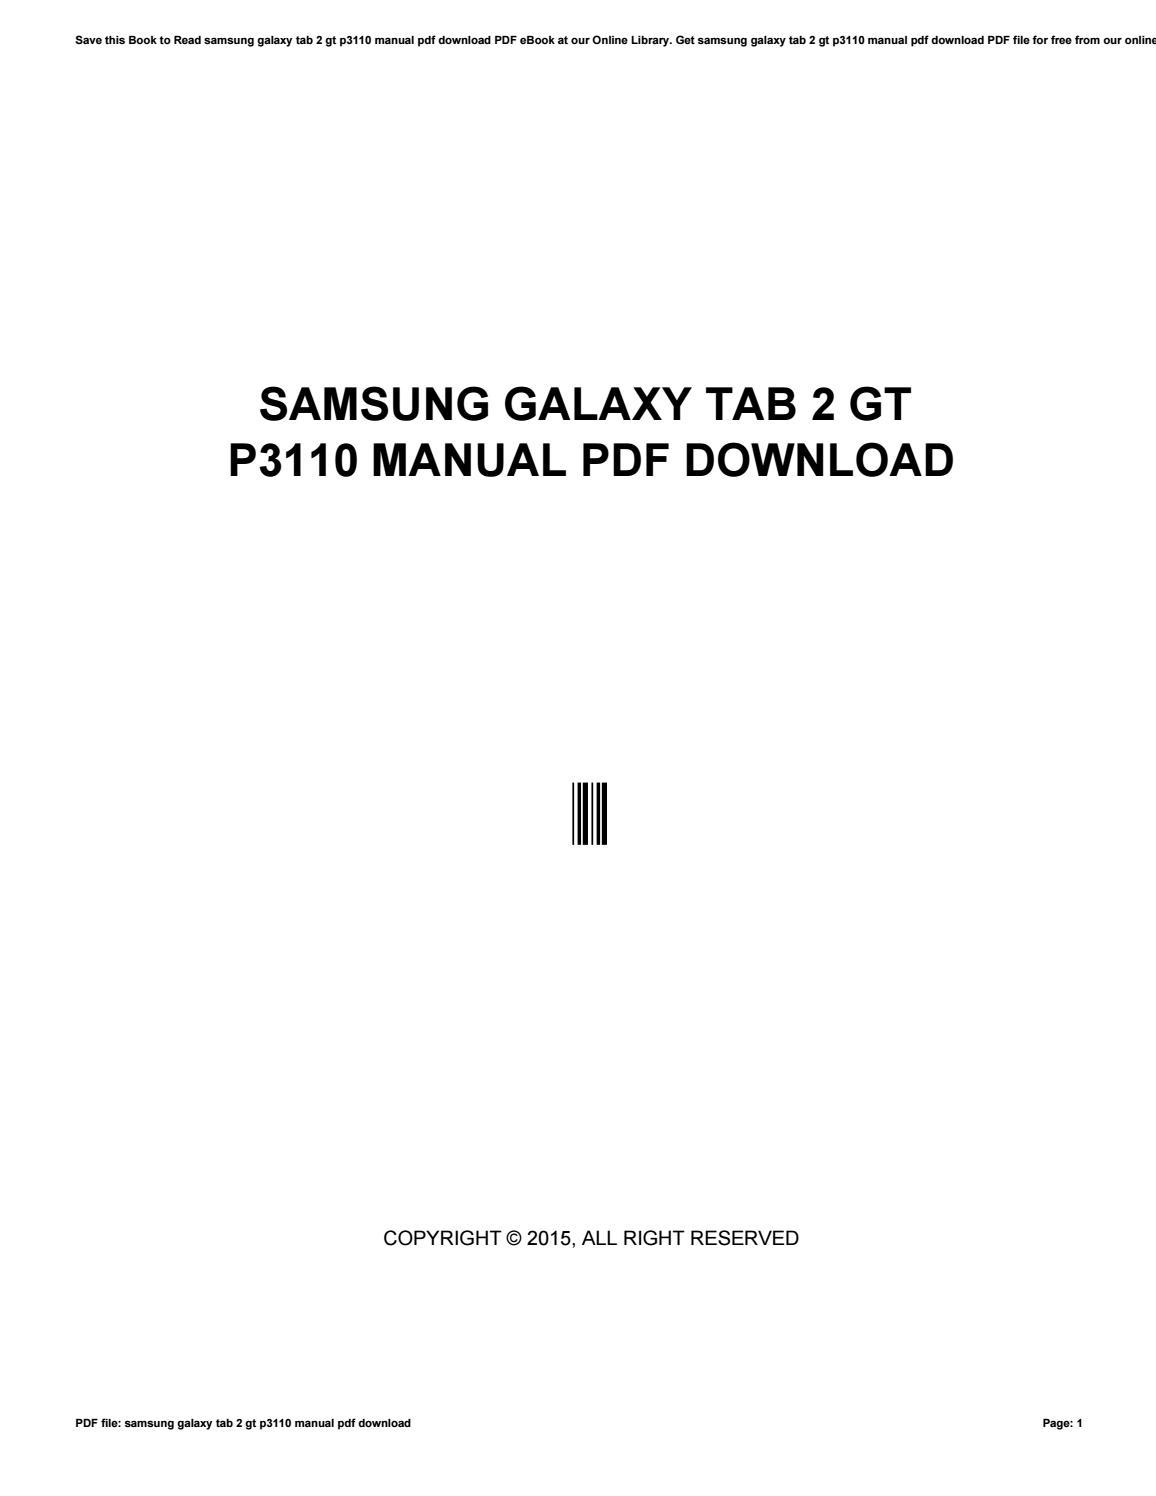 Manual tablet samsung galaxy tab 2 70 gt p3110 youtube.